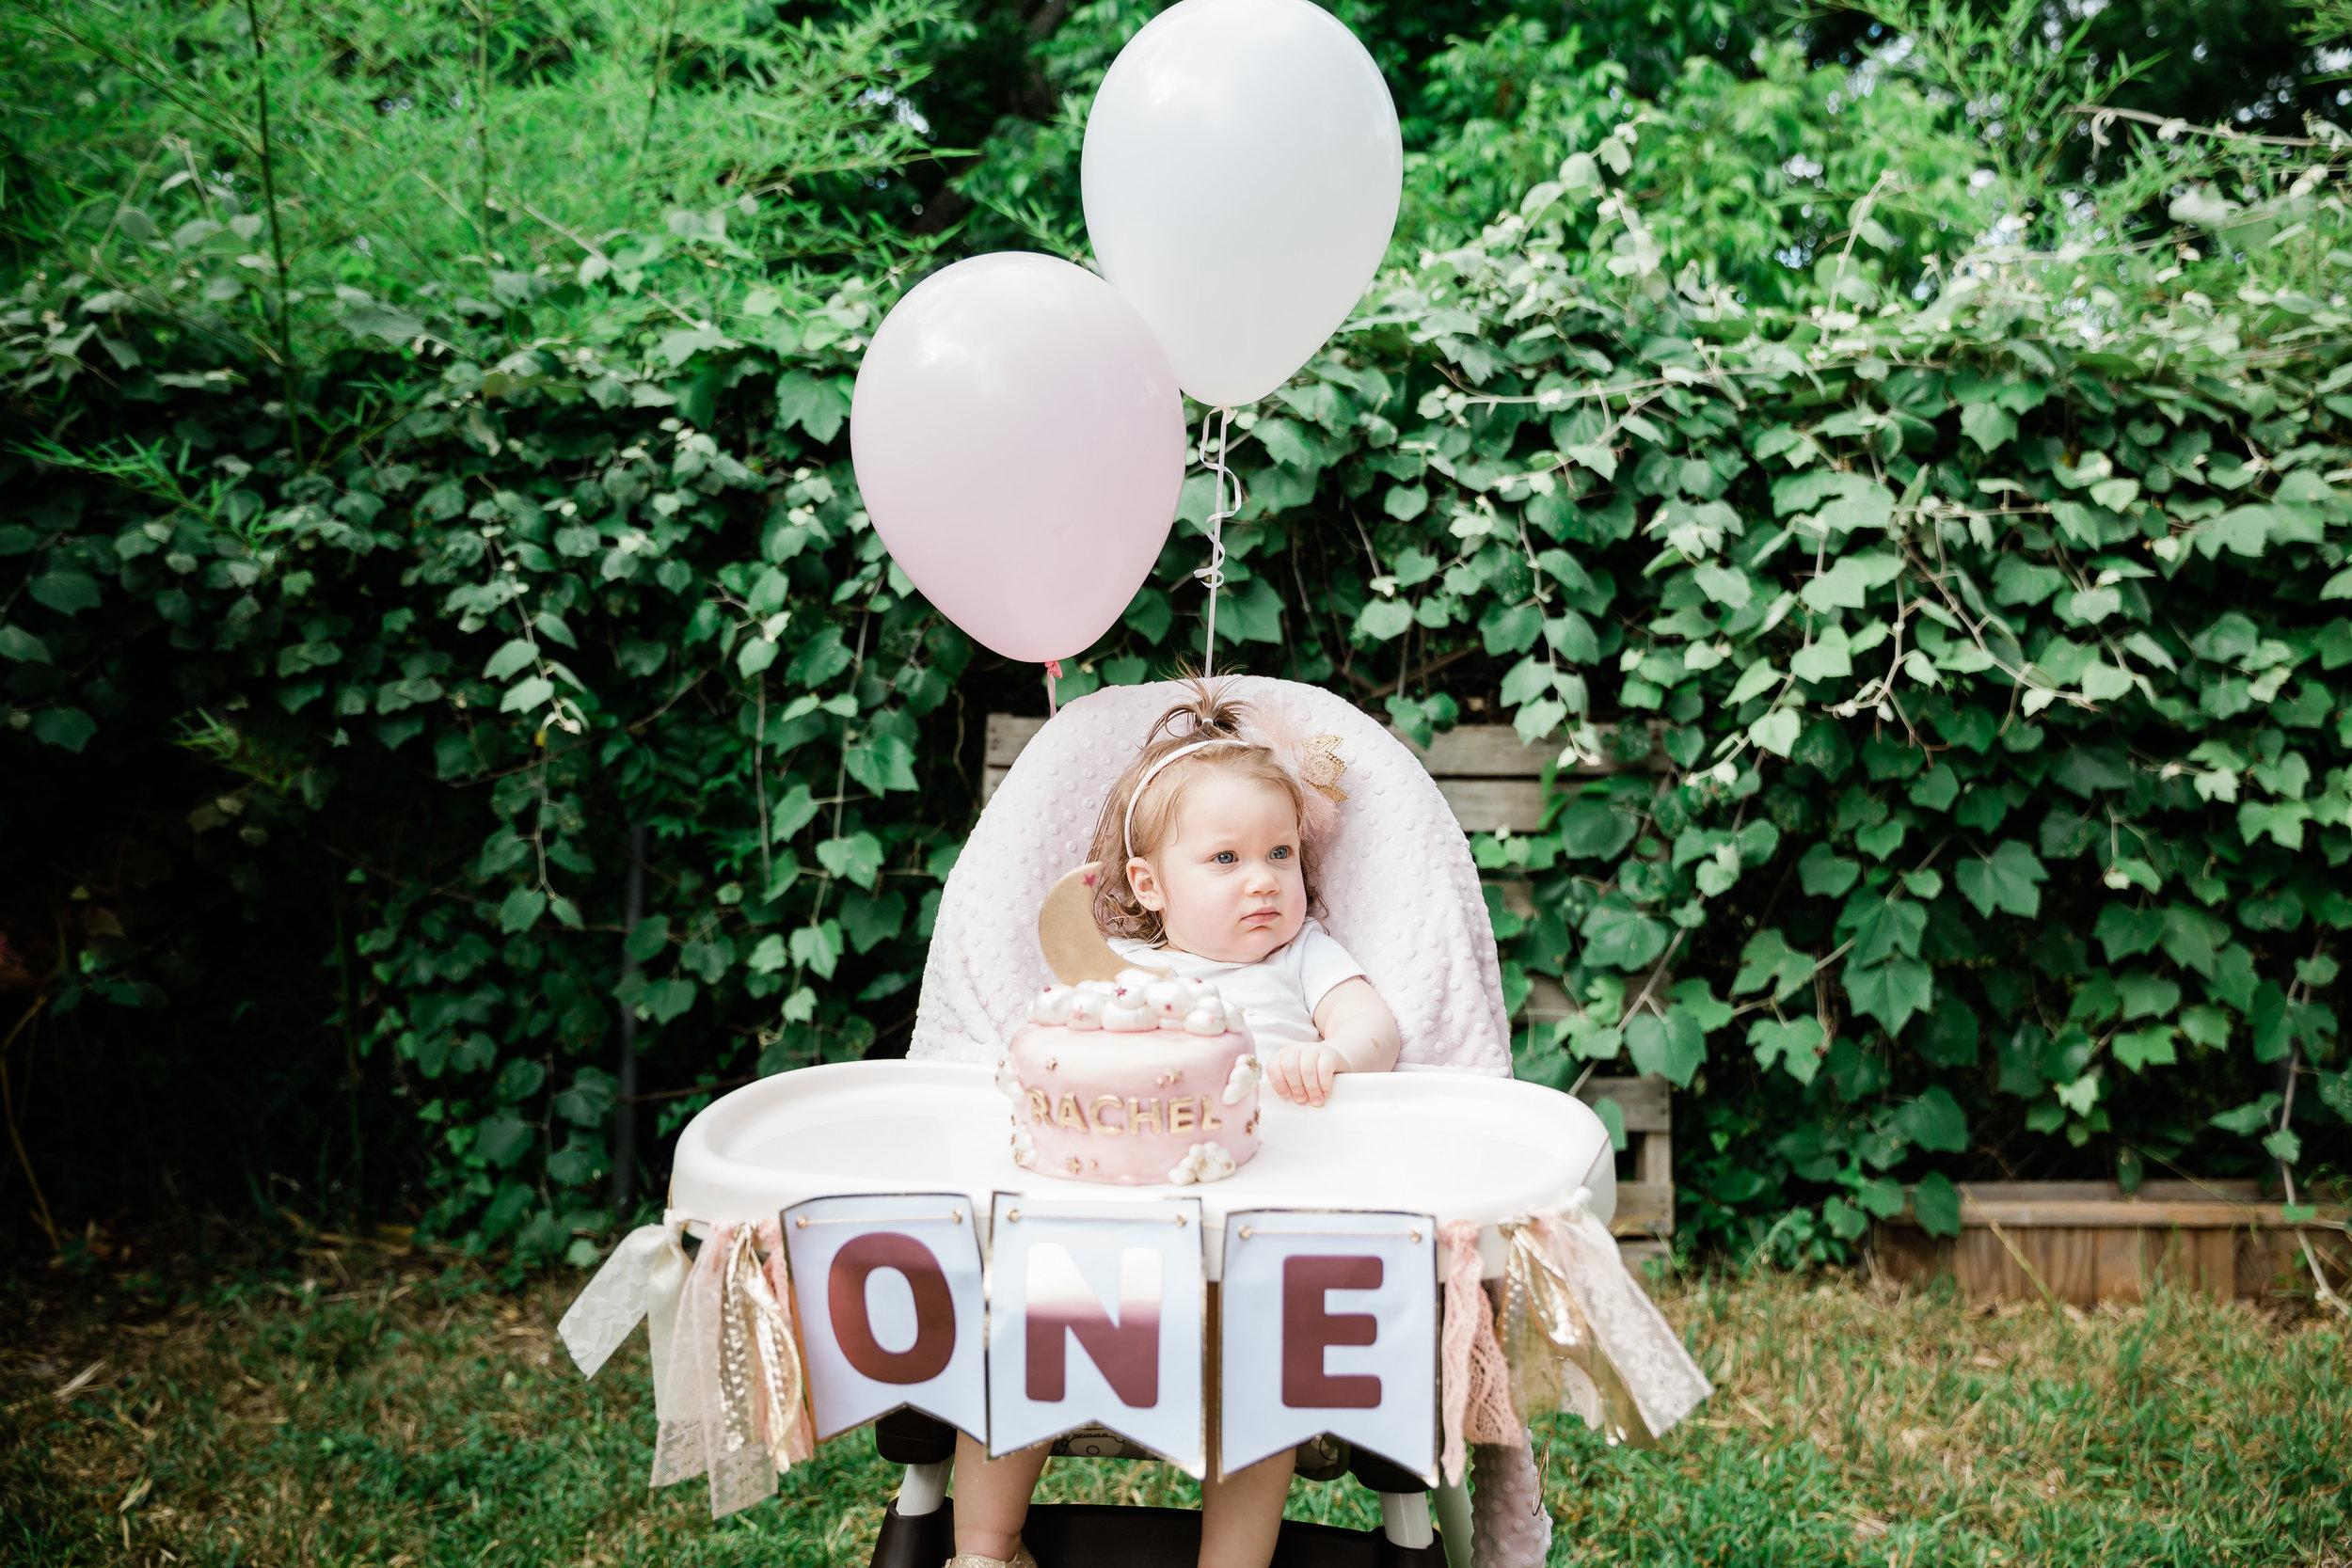 nashville-franklin-lifestyle-photographer-kids-birthday-45.jpg